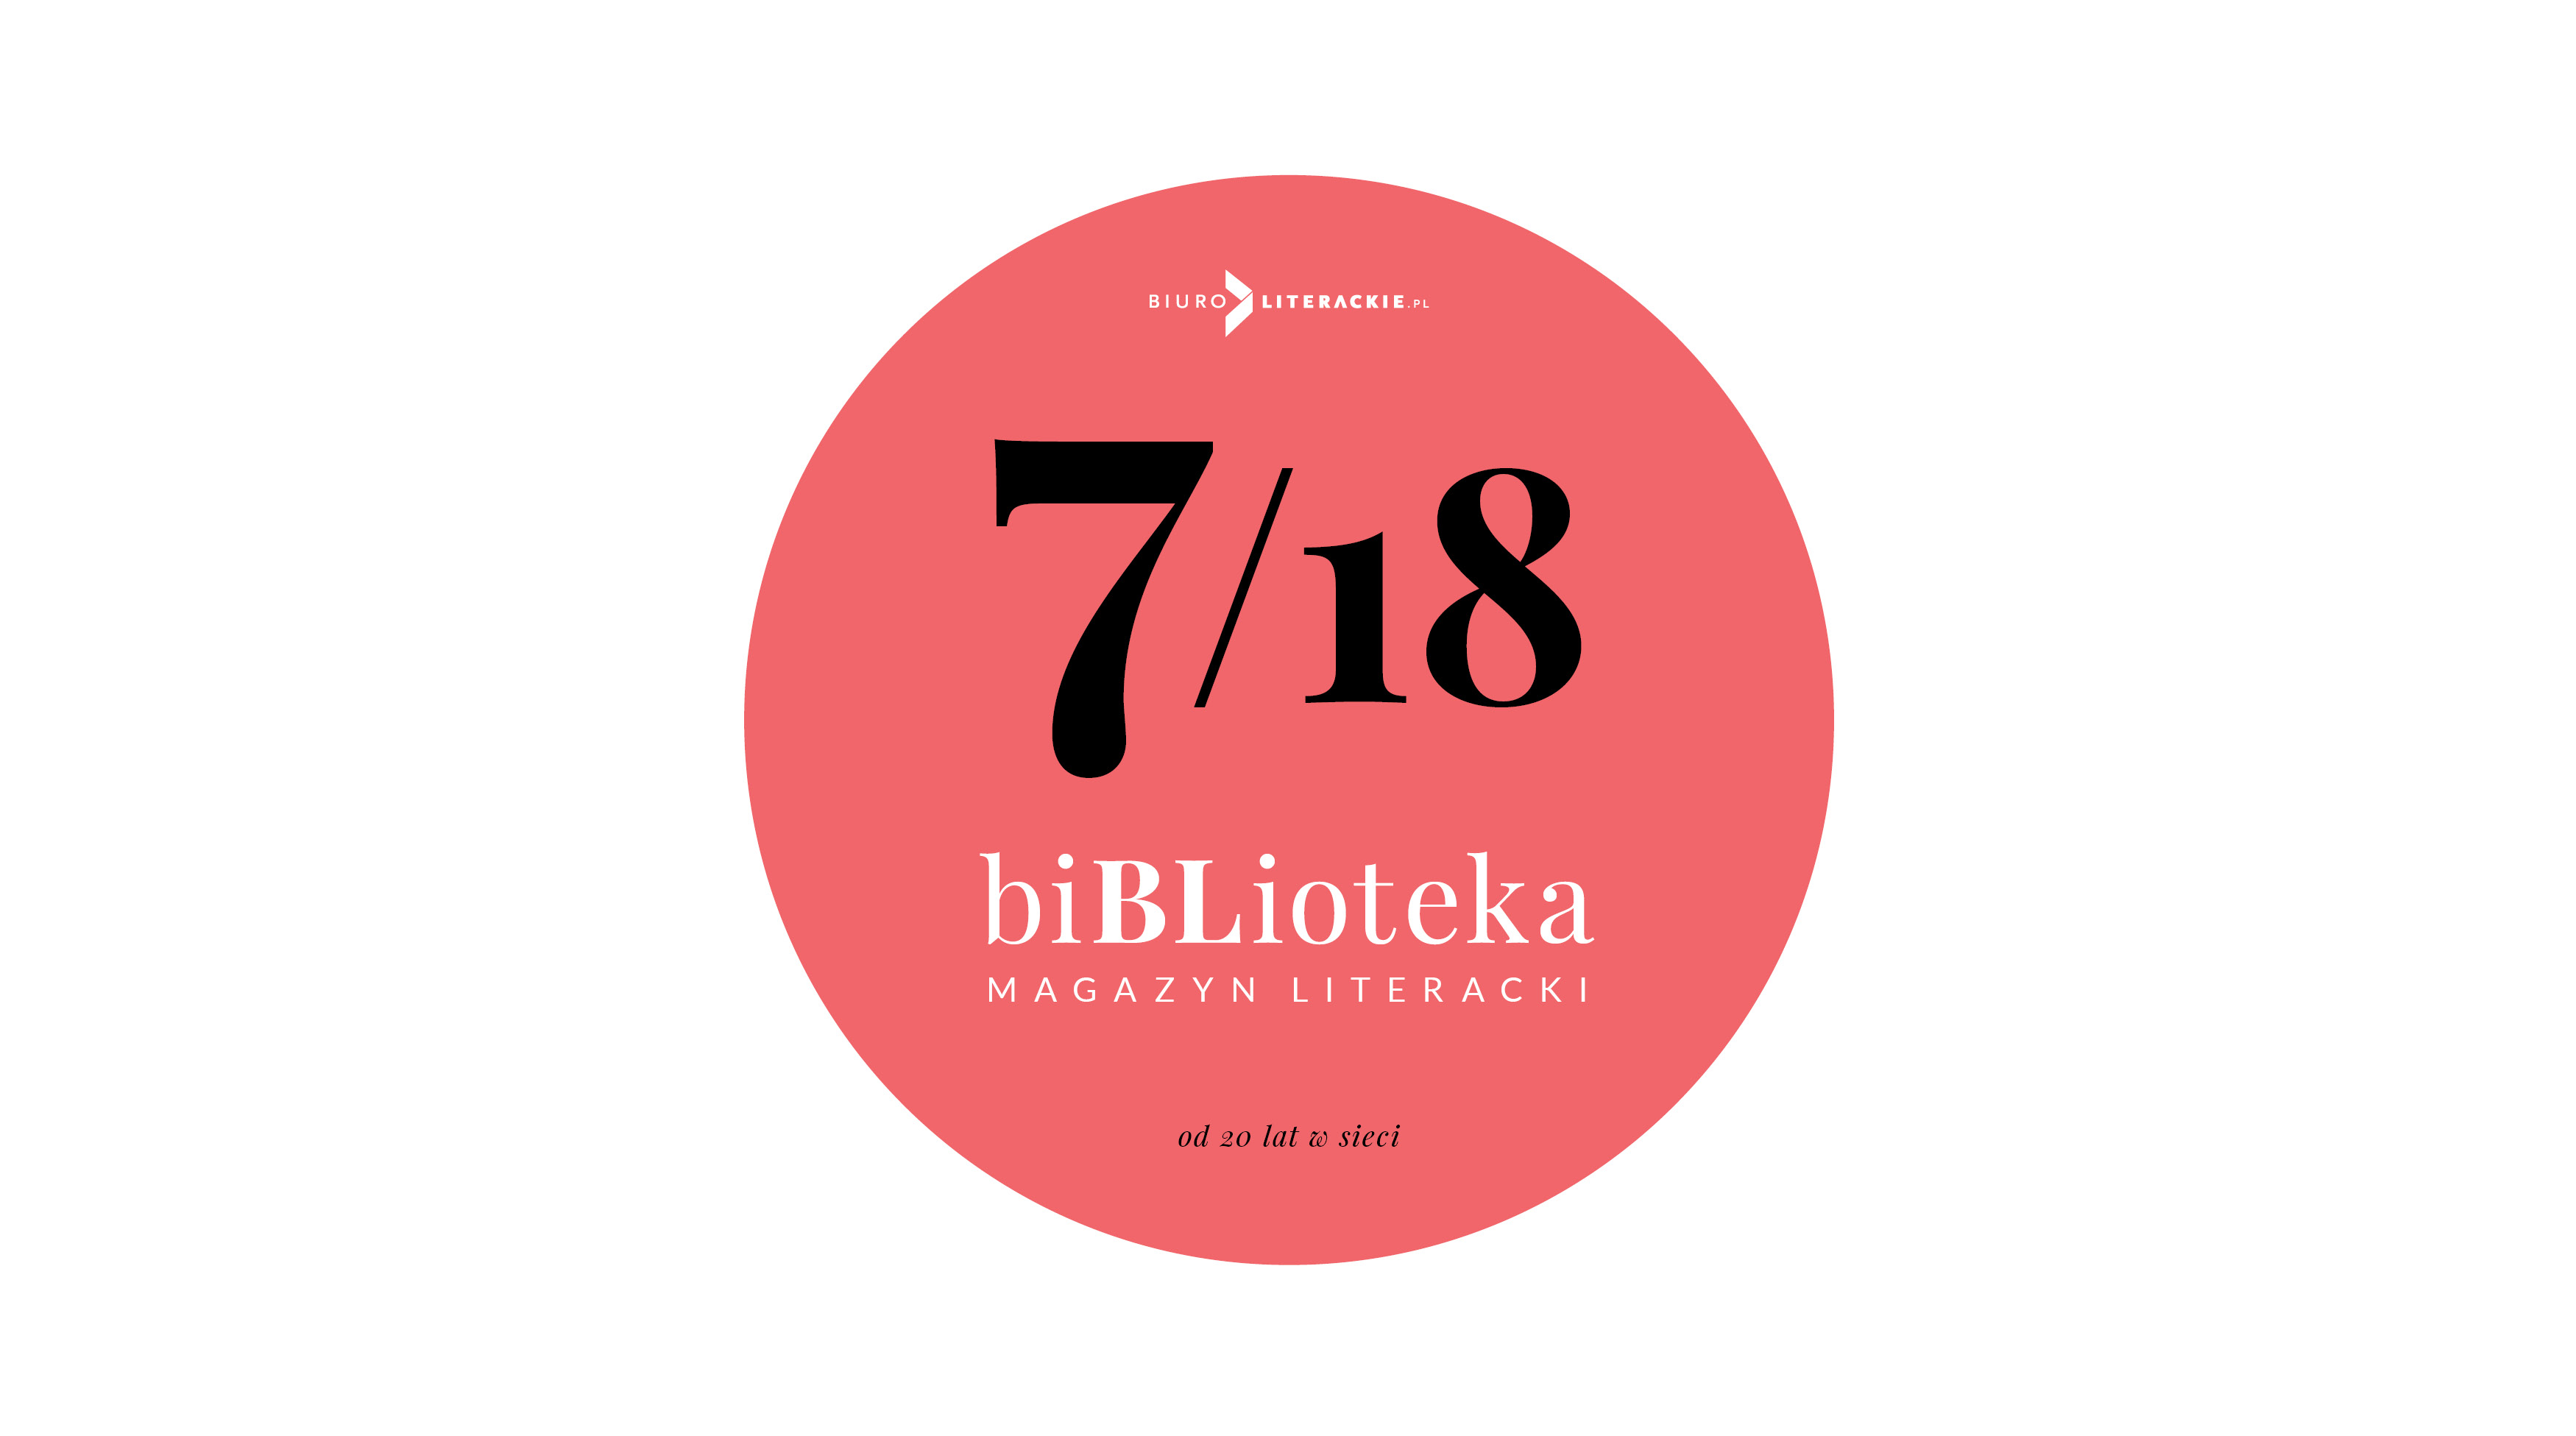 BL_Img_2018.05.22_biBLioteka_nr_7__www_top